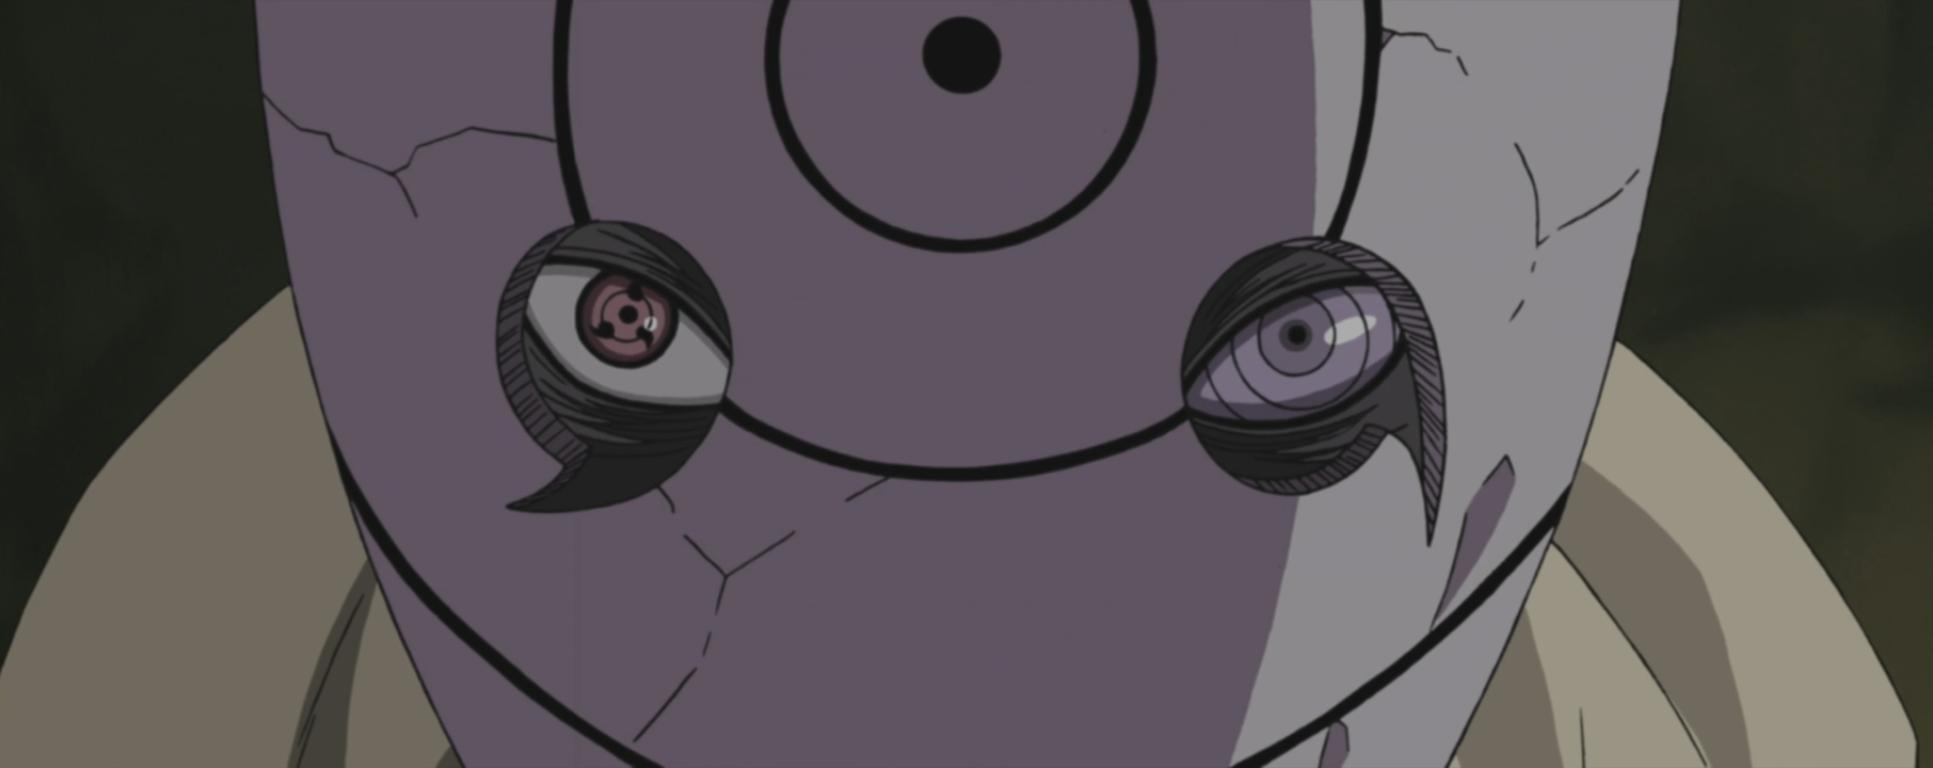 Rinnegan Ready for Battle – Naruto Shippuden 255 | Daily ...